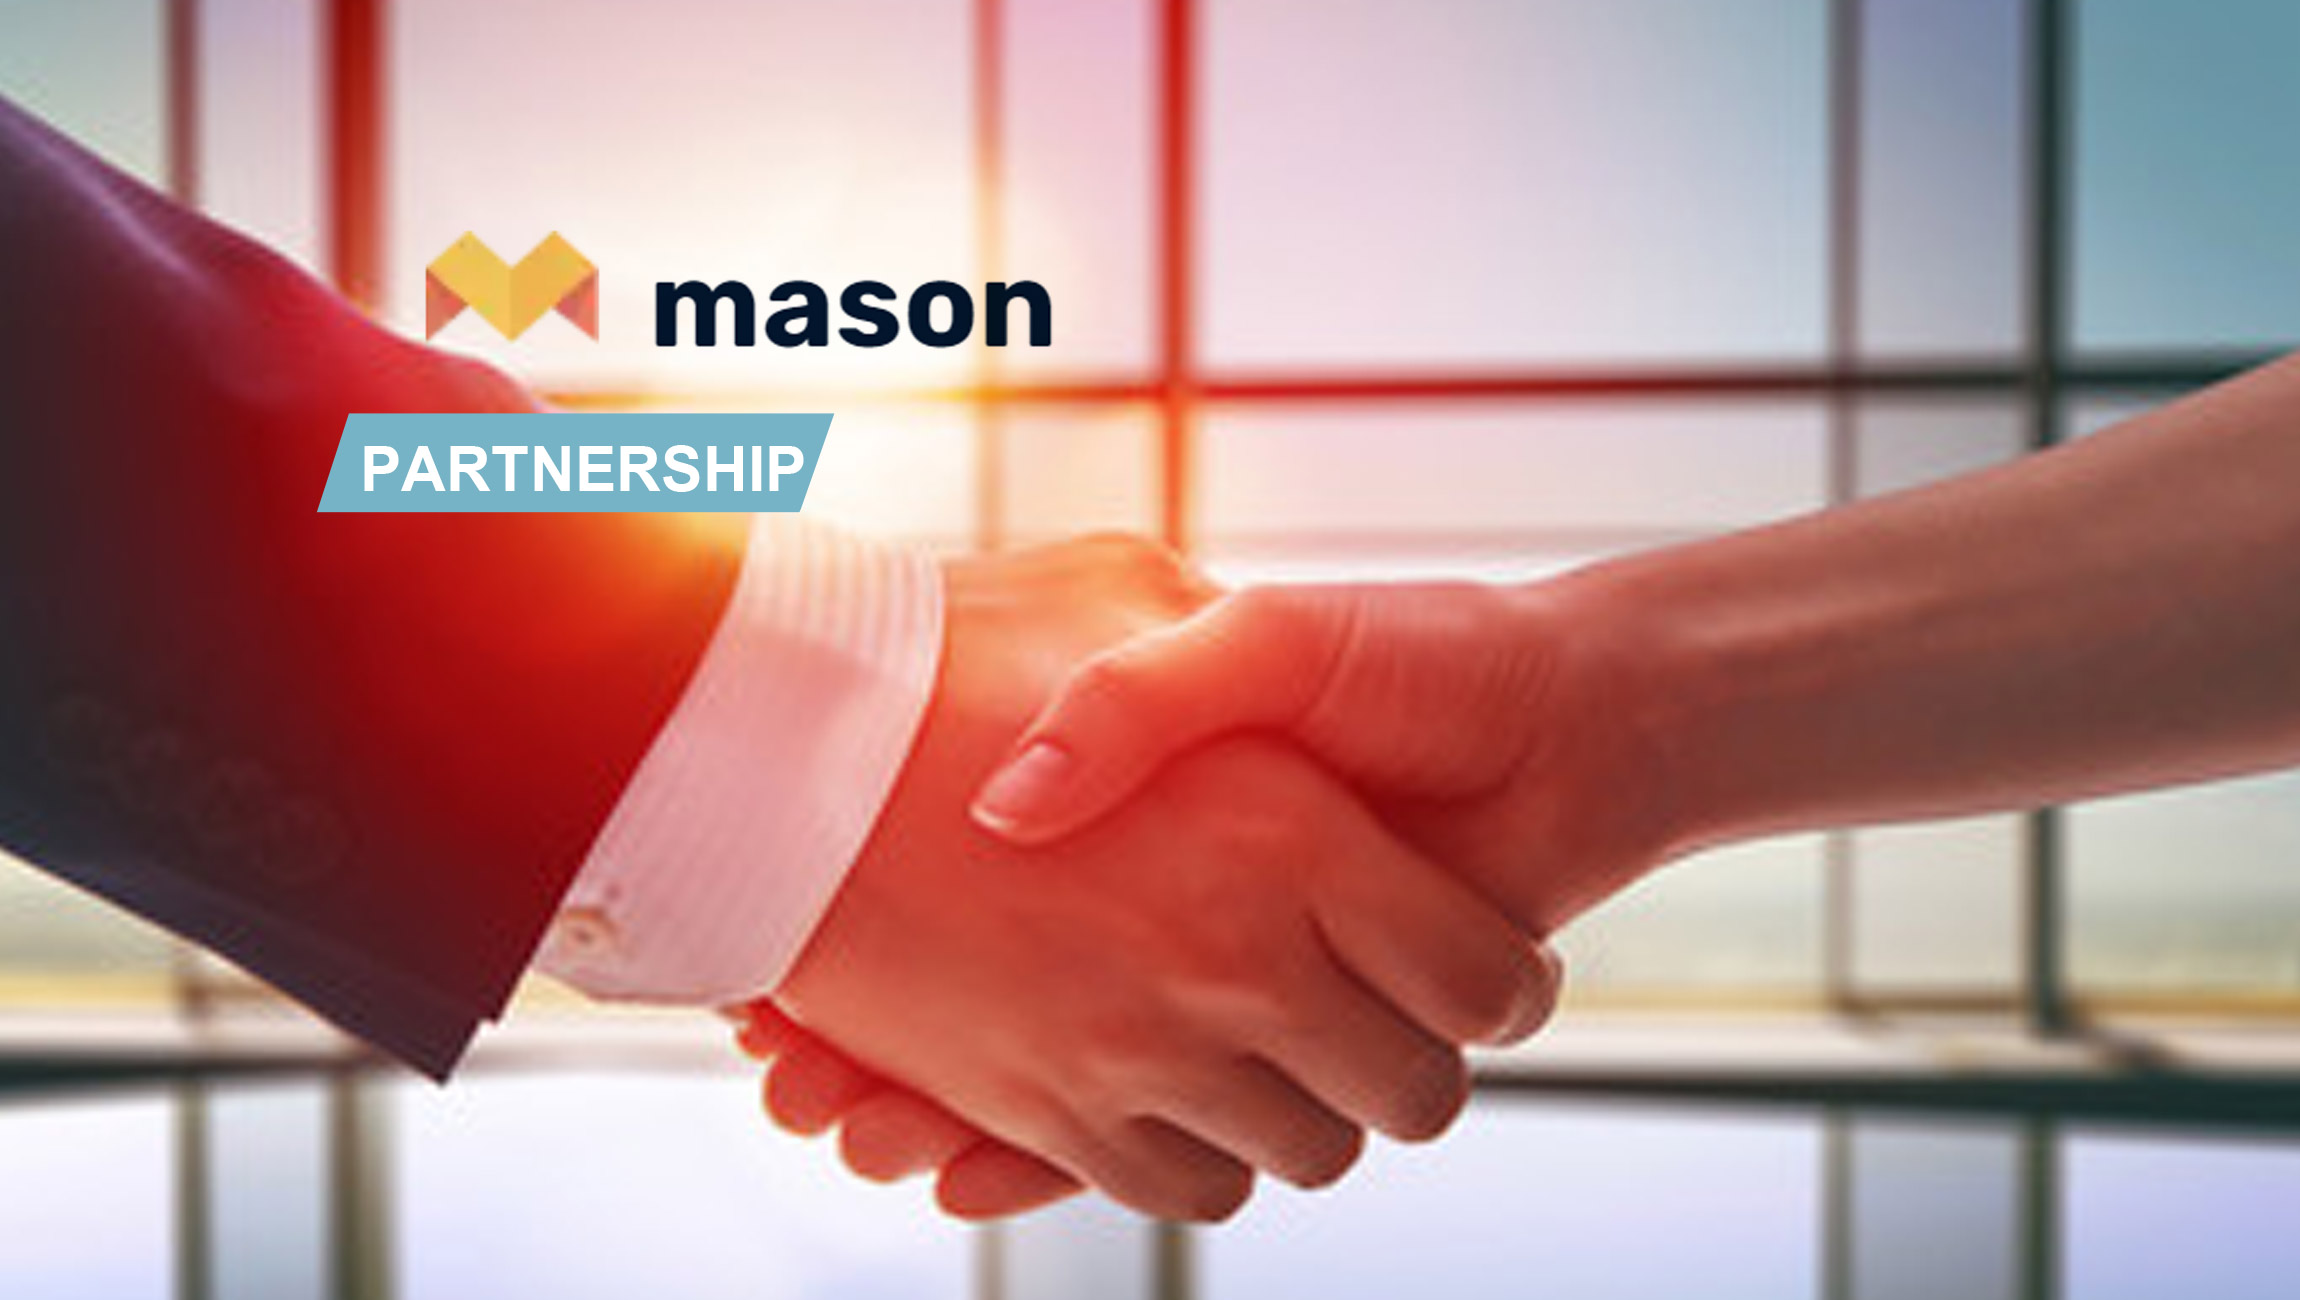 Mason launches ModeMagic Partner Program to helps SMBs Streamline Their Online Merchandising Needs